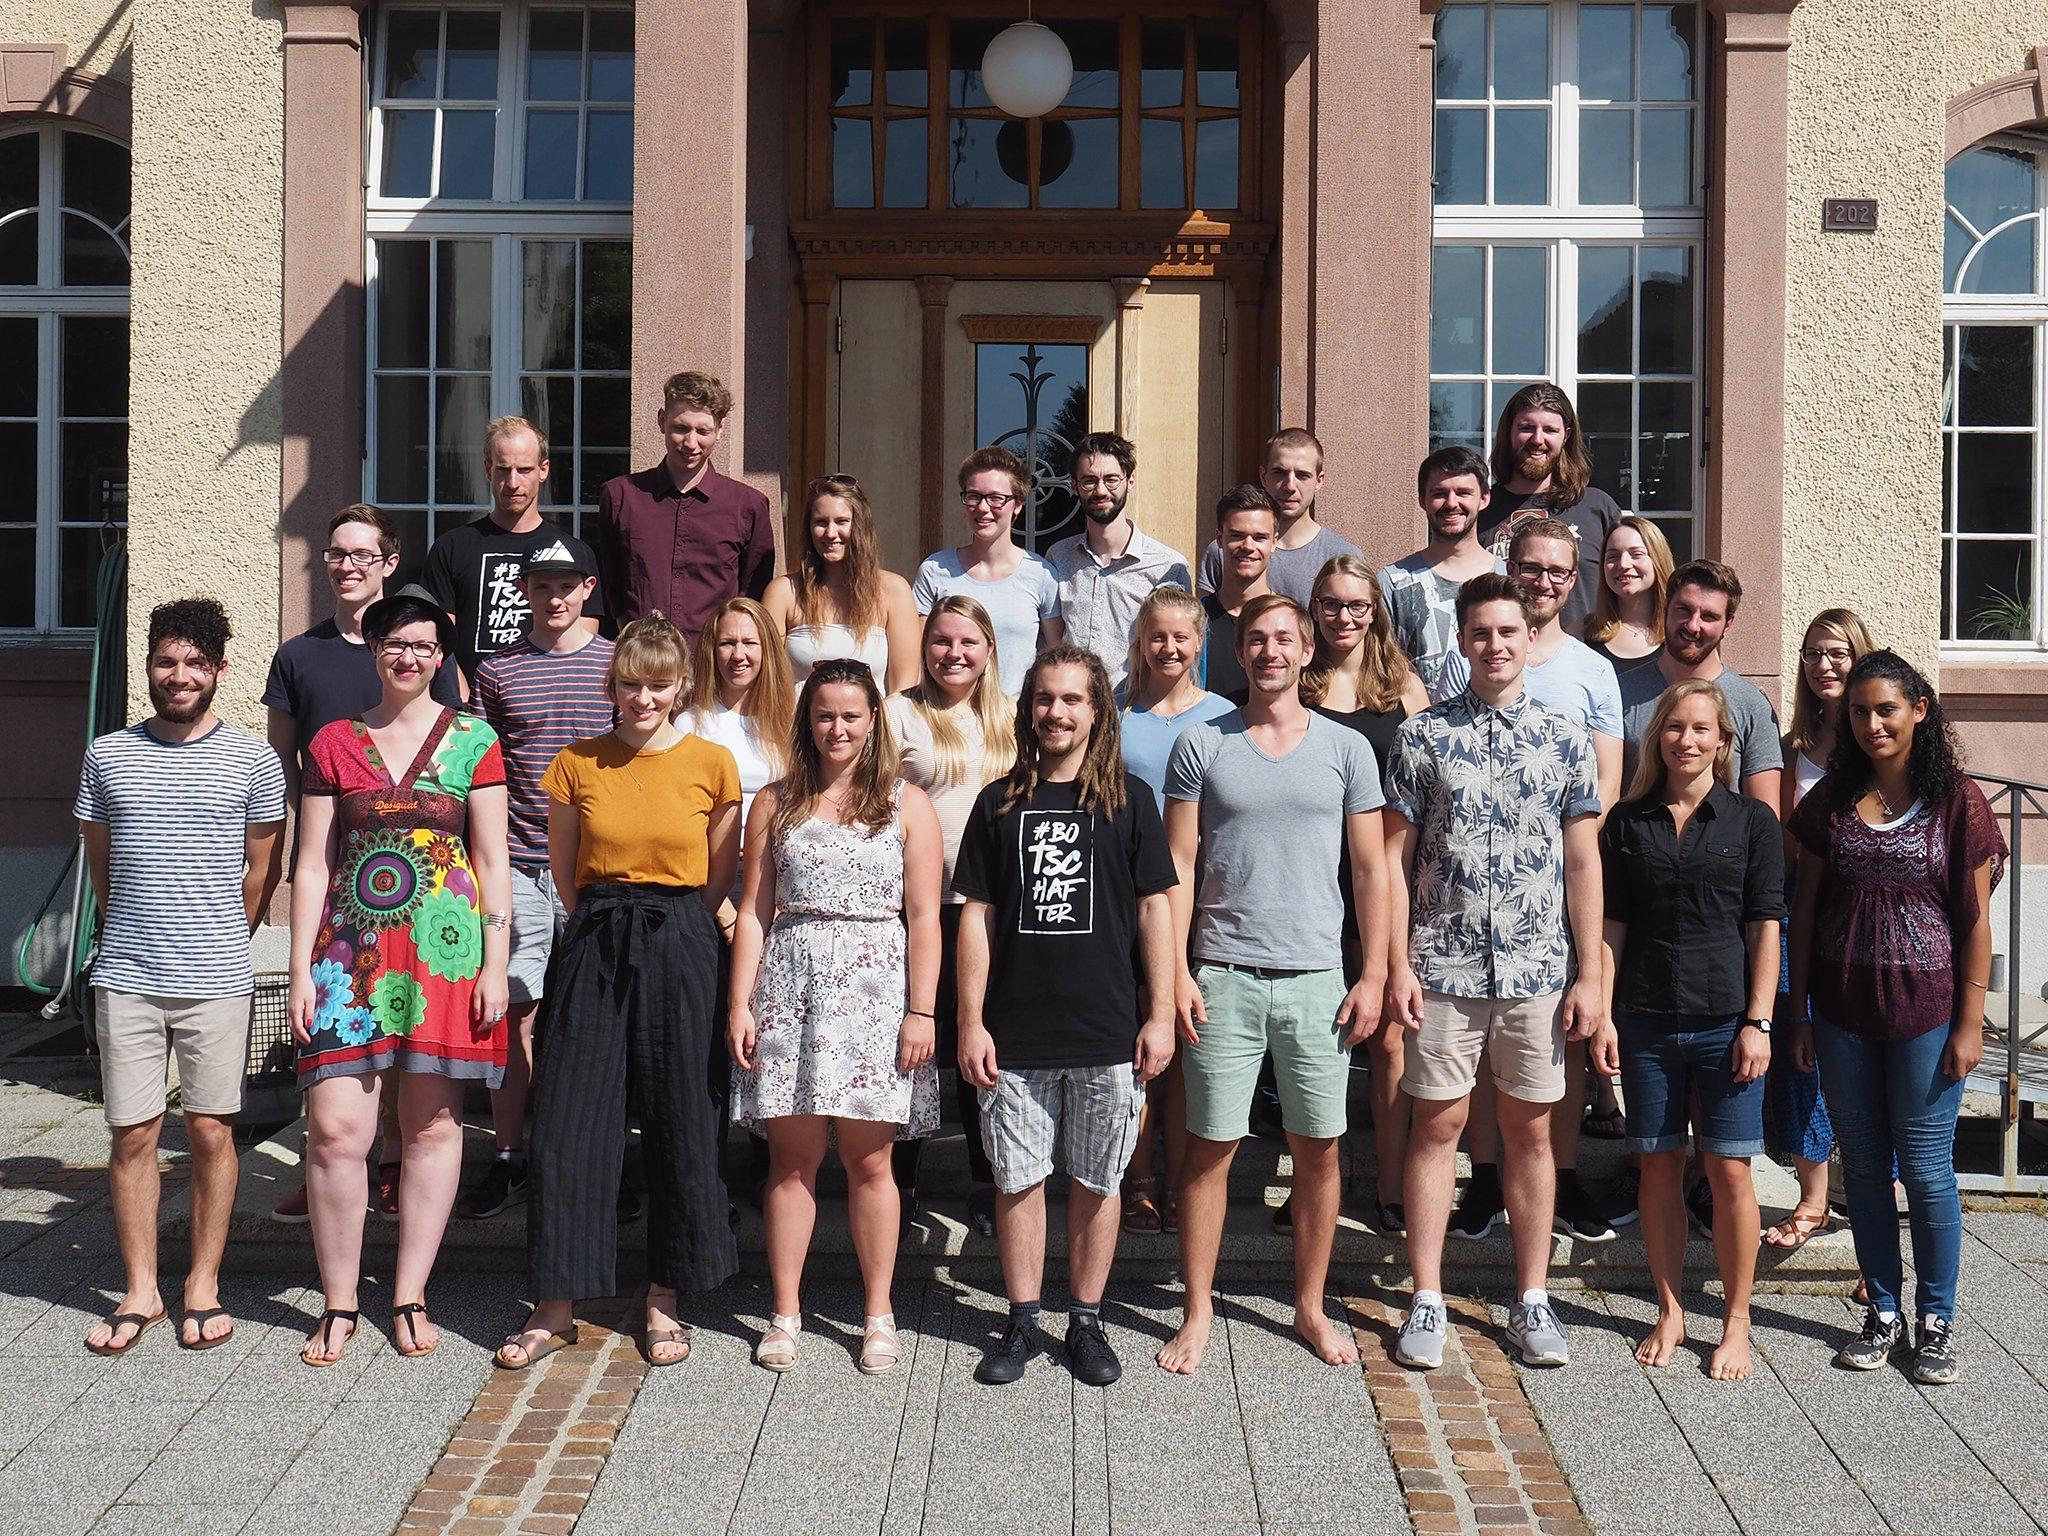 tsc-Start 19/20: Studierende im Bachelorstudiengang Theologie & Musik